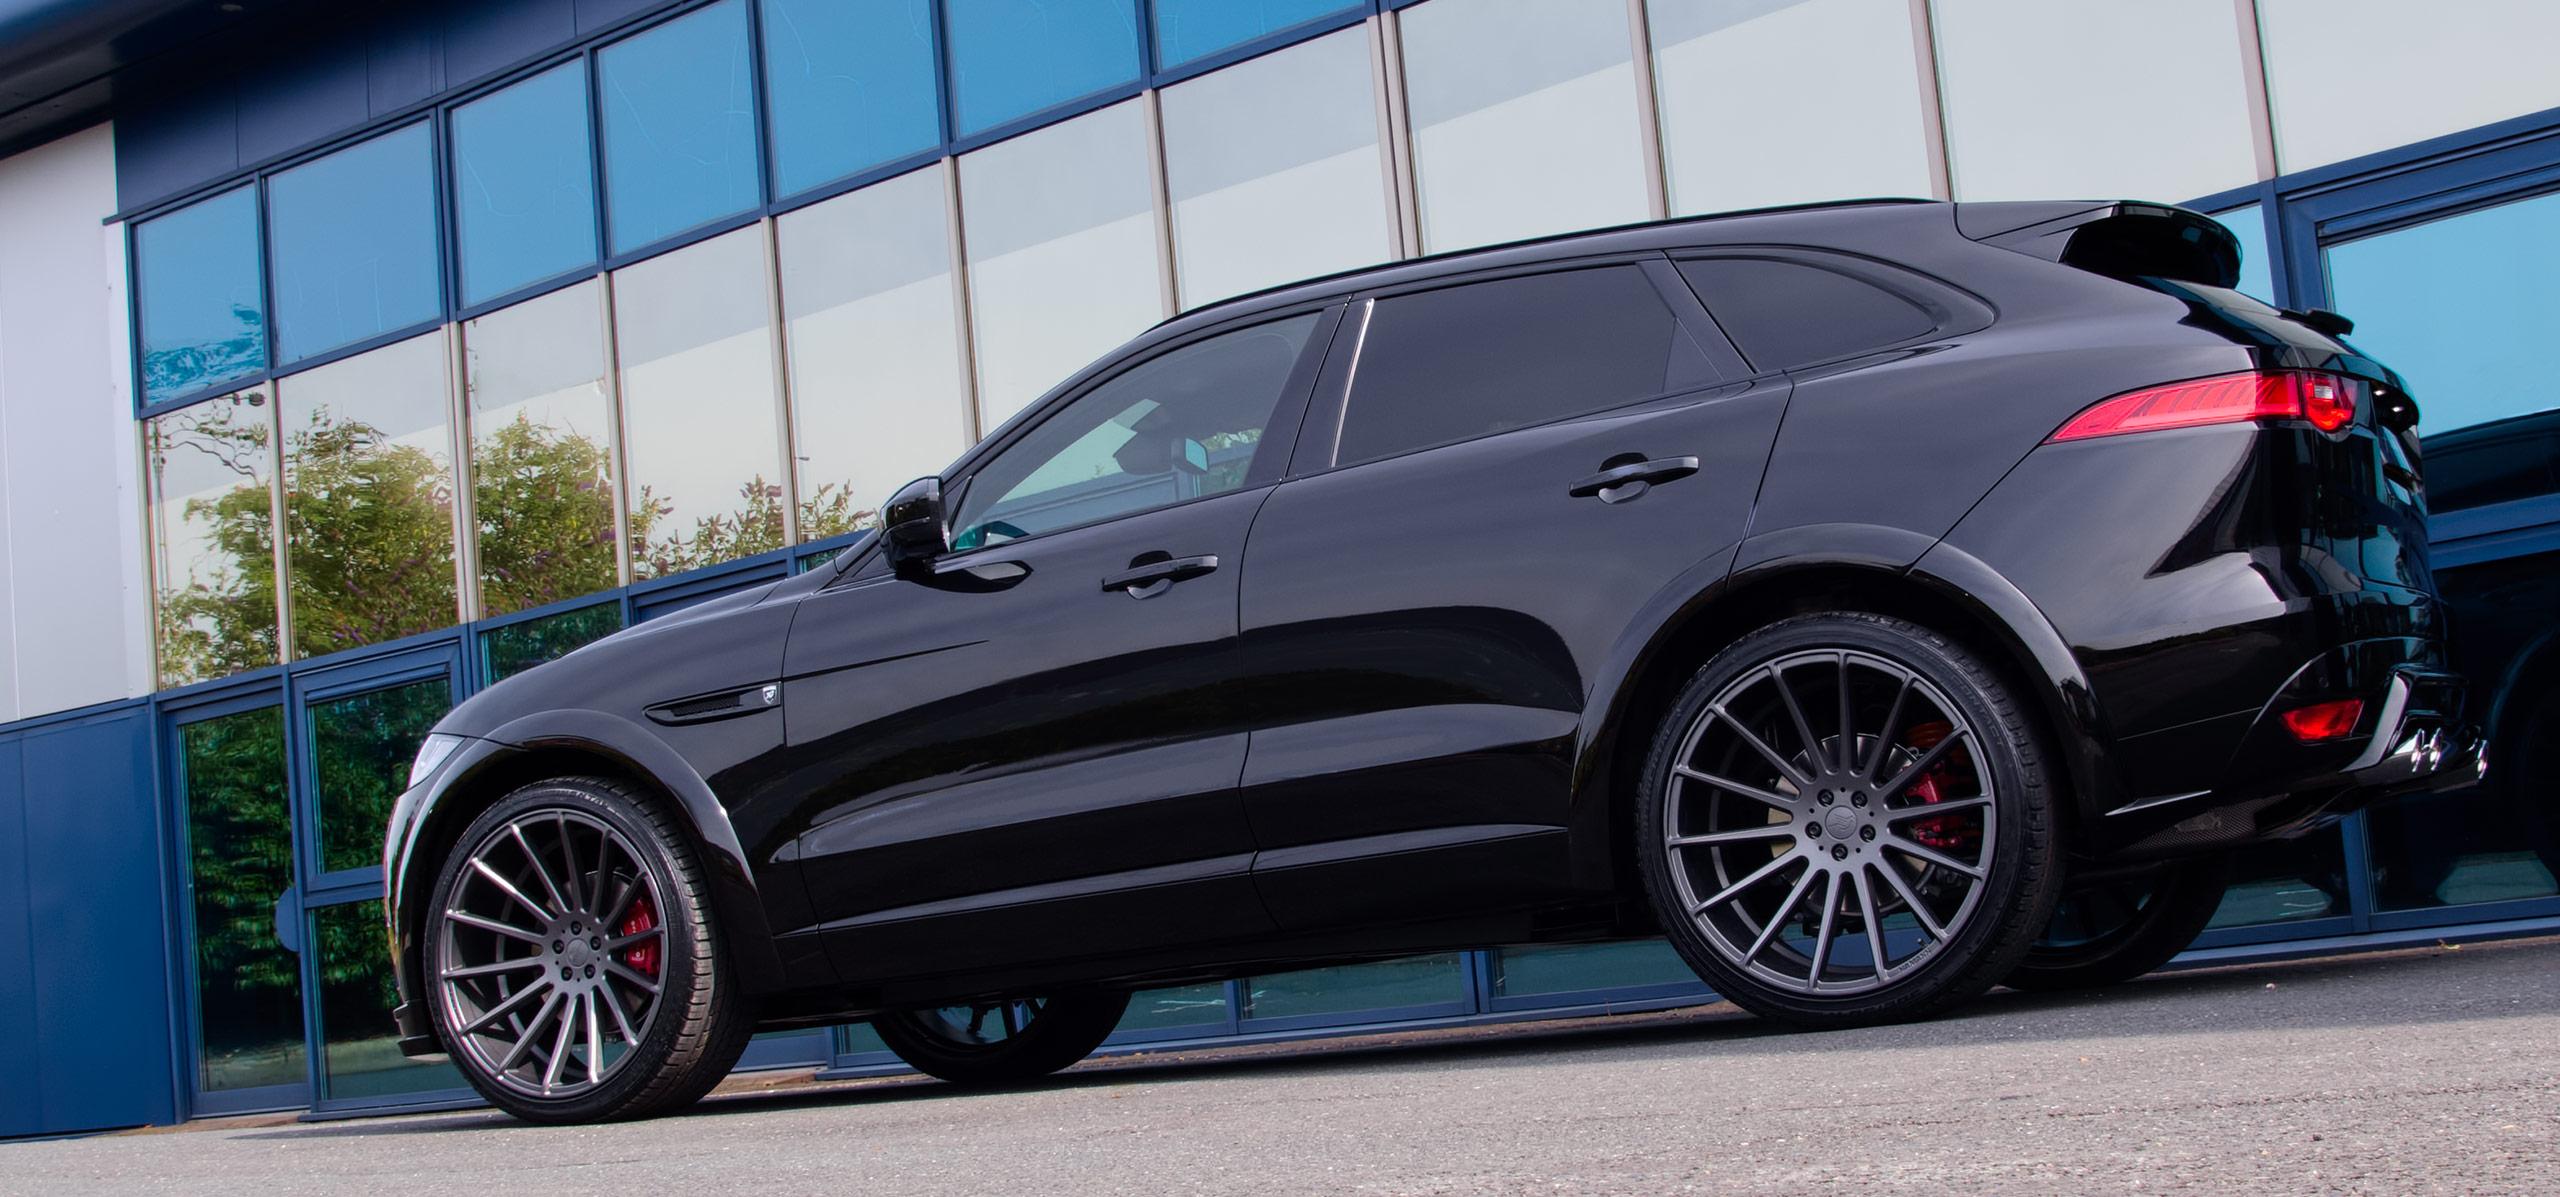 BMW Pre Owned >> Jaguar F-Pace - Hamann Motorsport UK